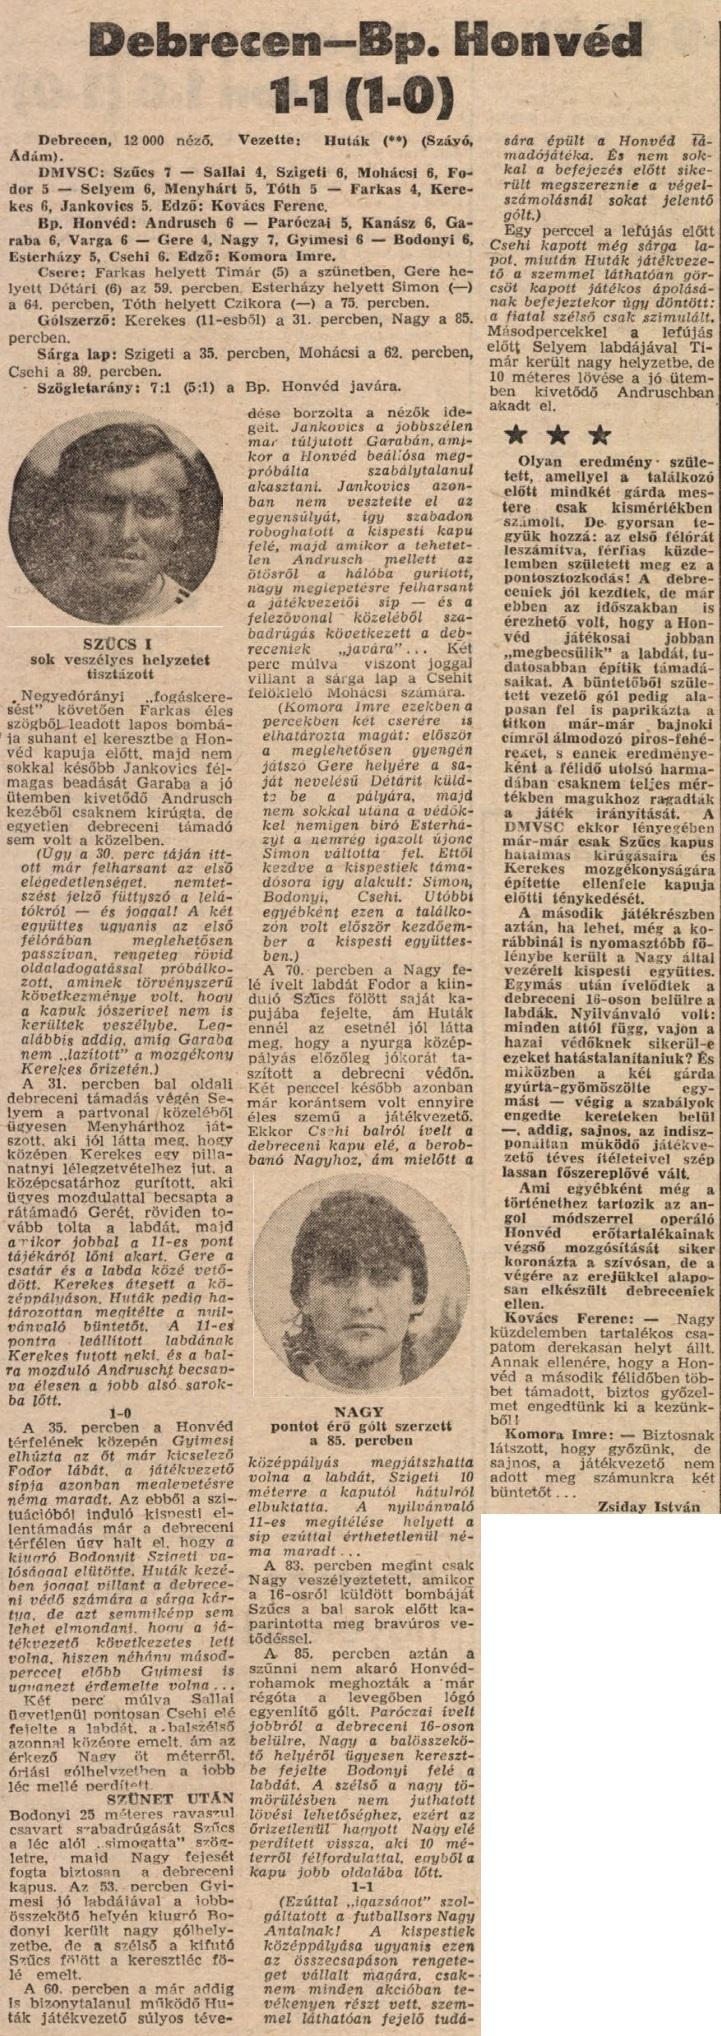 idokapszula_nb_i_1982_83_19_fordulo_dmvsc_bp_honved.jpg